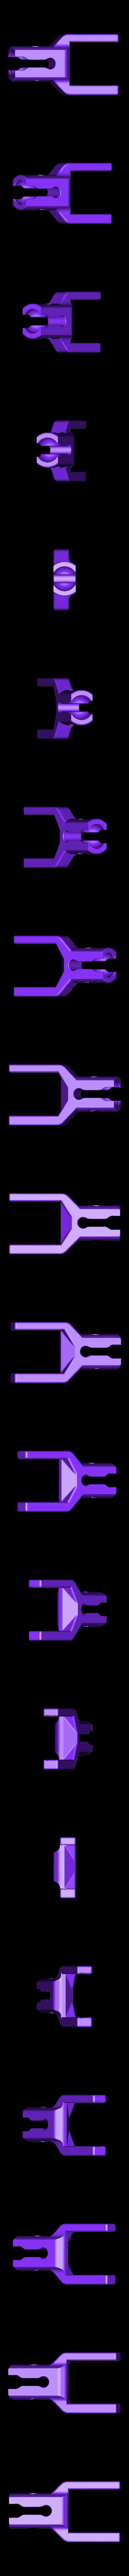 LinkM3_PiCam_original_v2.stl Download free STL file Raspberry PI CAM Holder • 3D printable object, a69291954